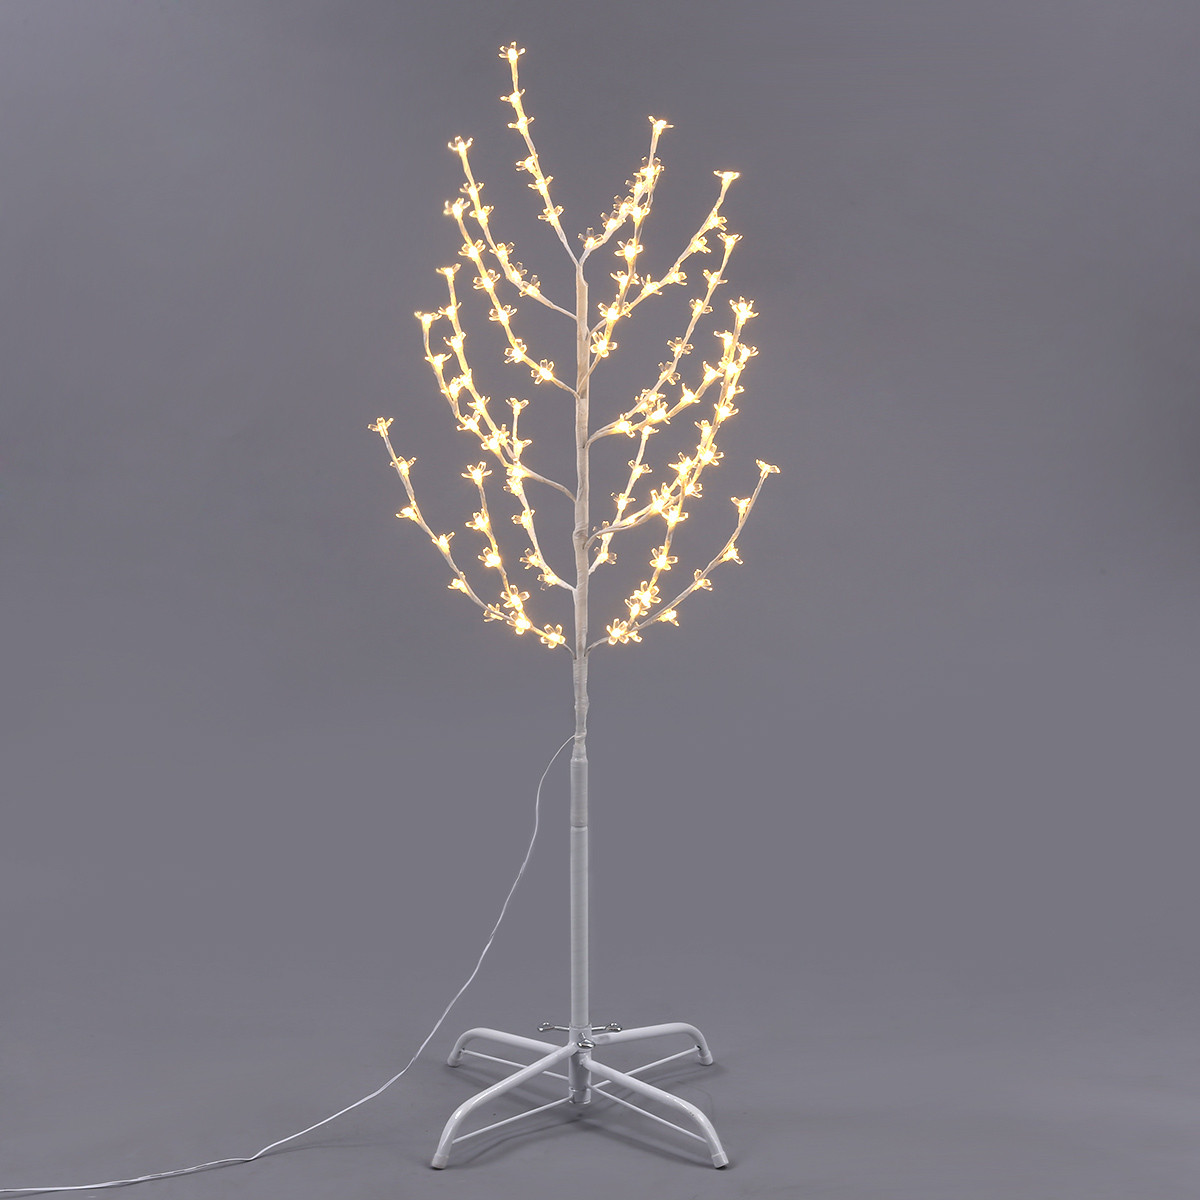 Indoor Outdoor Christmas Light  Waterproof LED Christmas Light Tree Lights Warm White Home